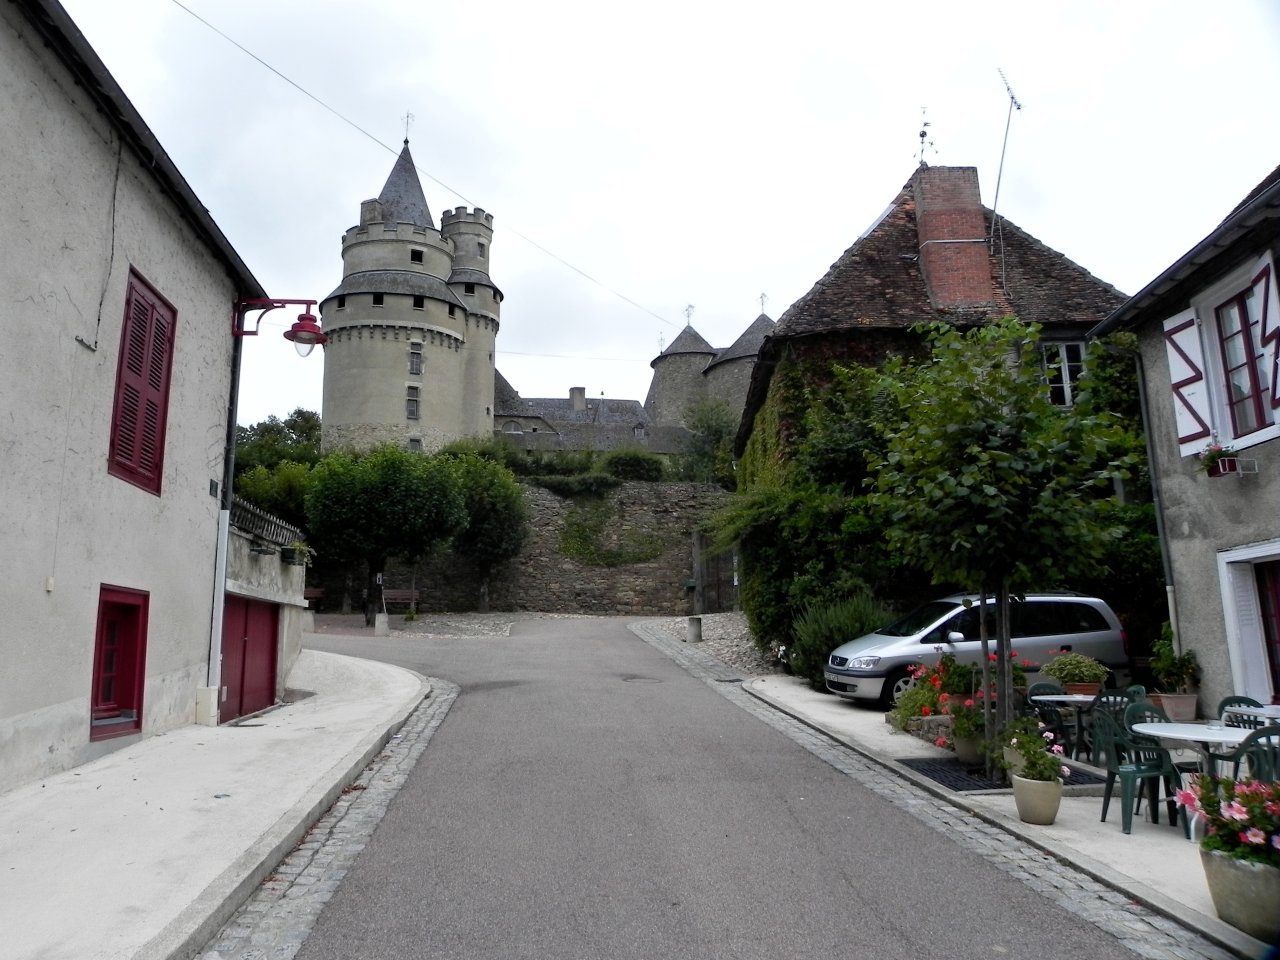 Bonneval, Castles in France